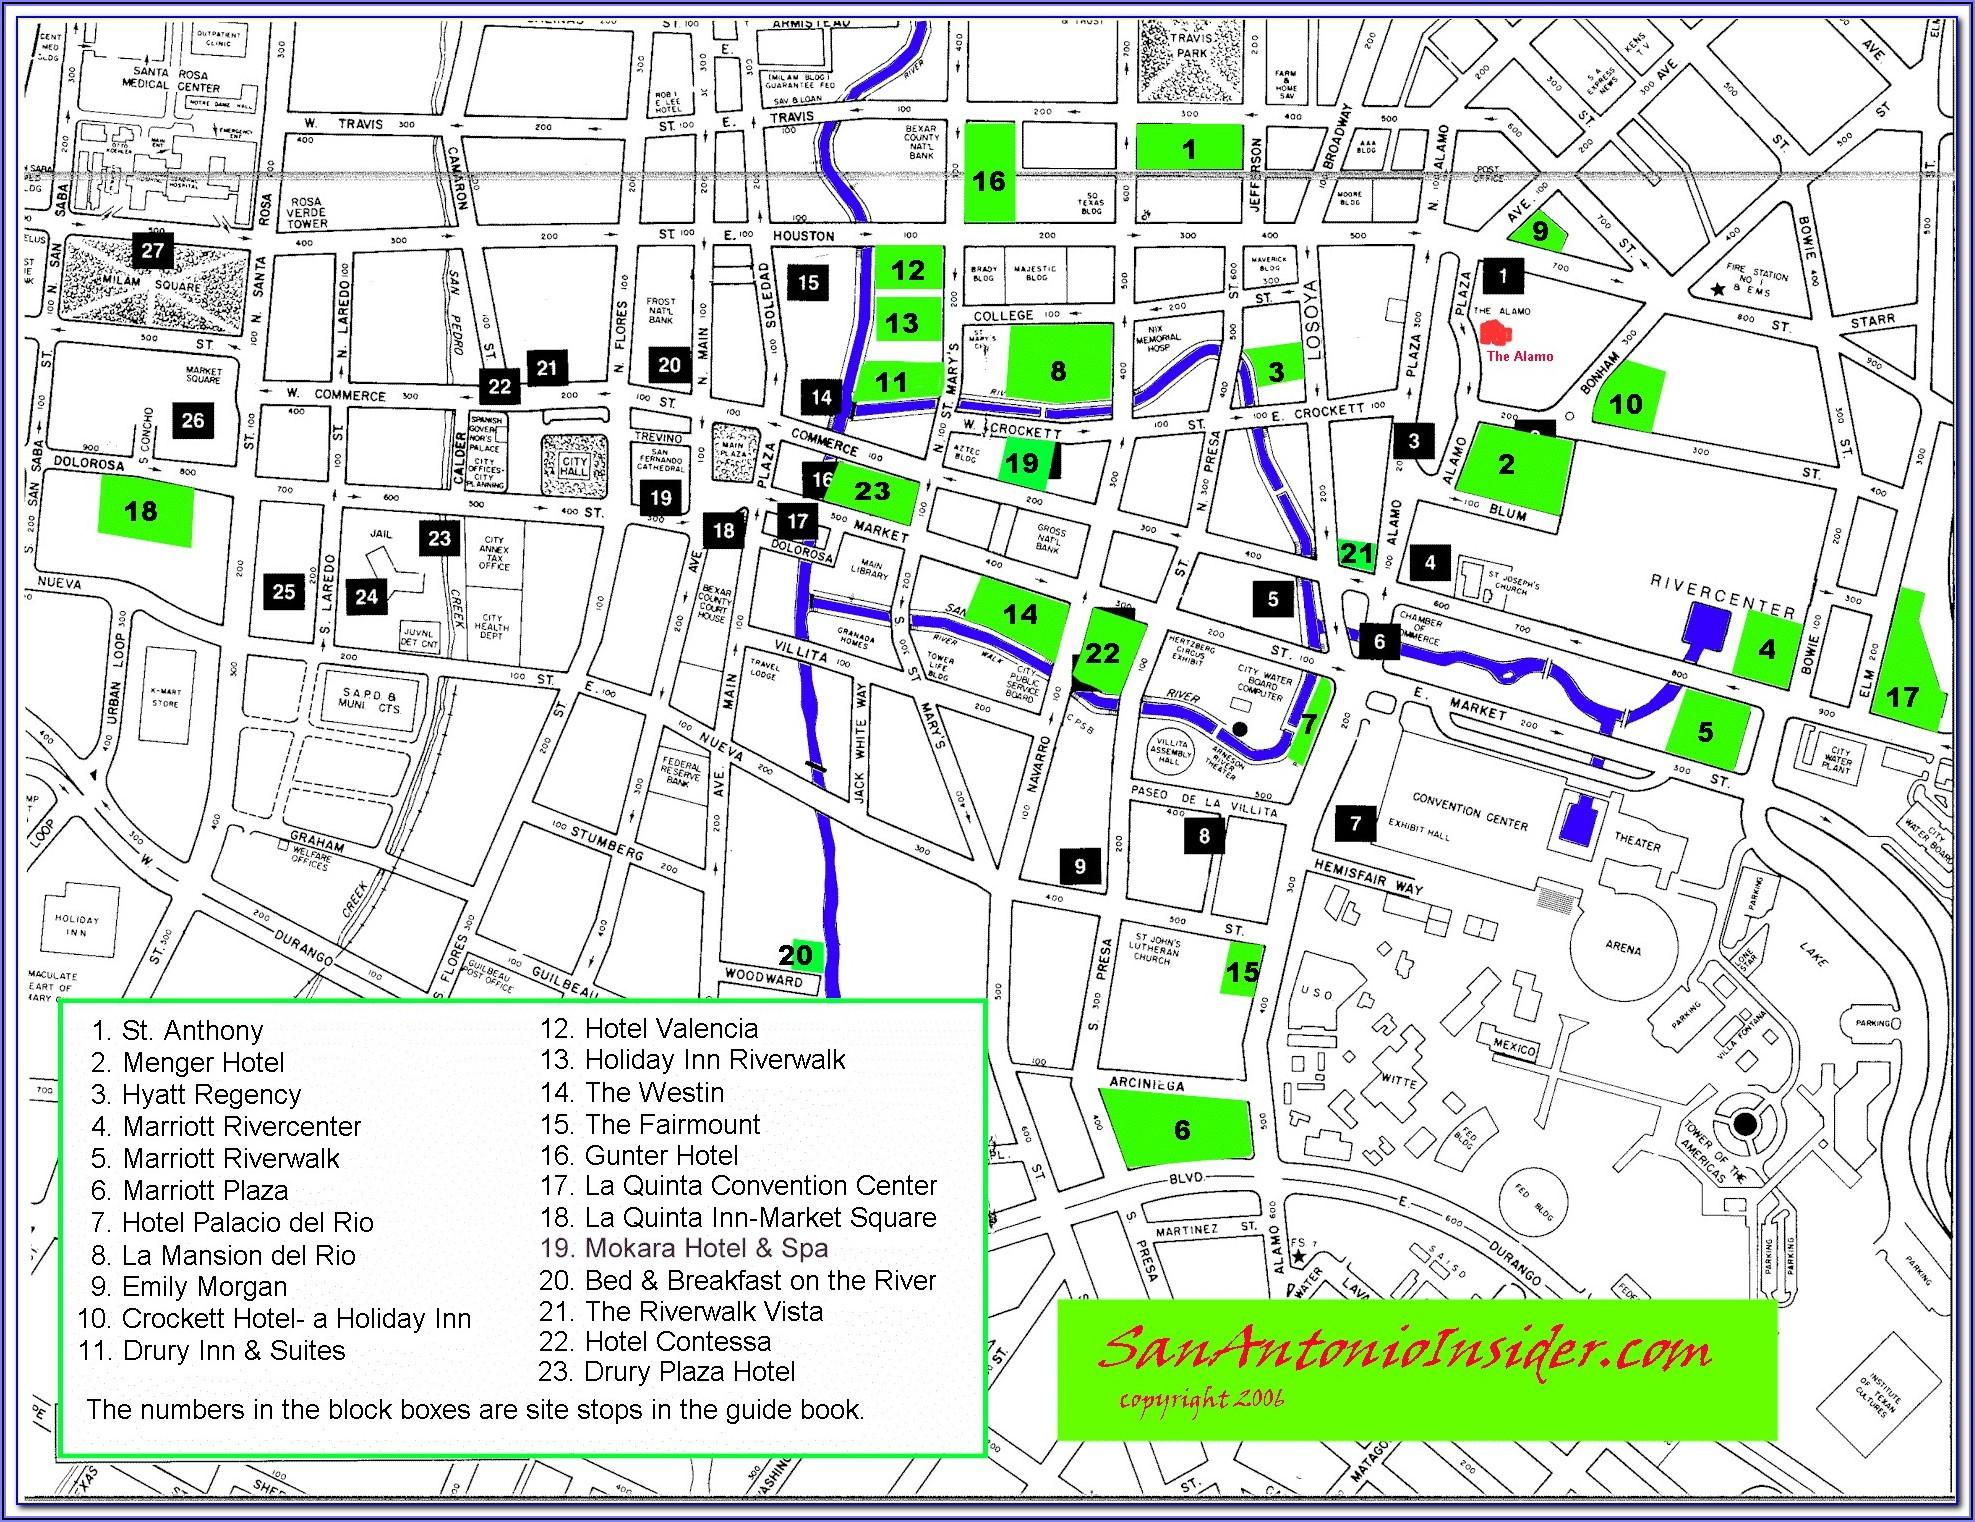 Mayan Riviera Hotels Map